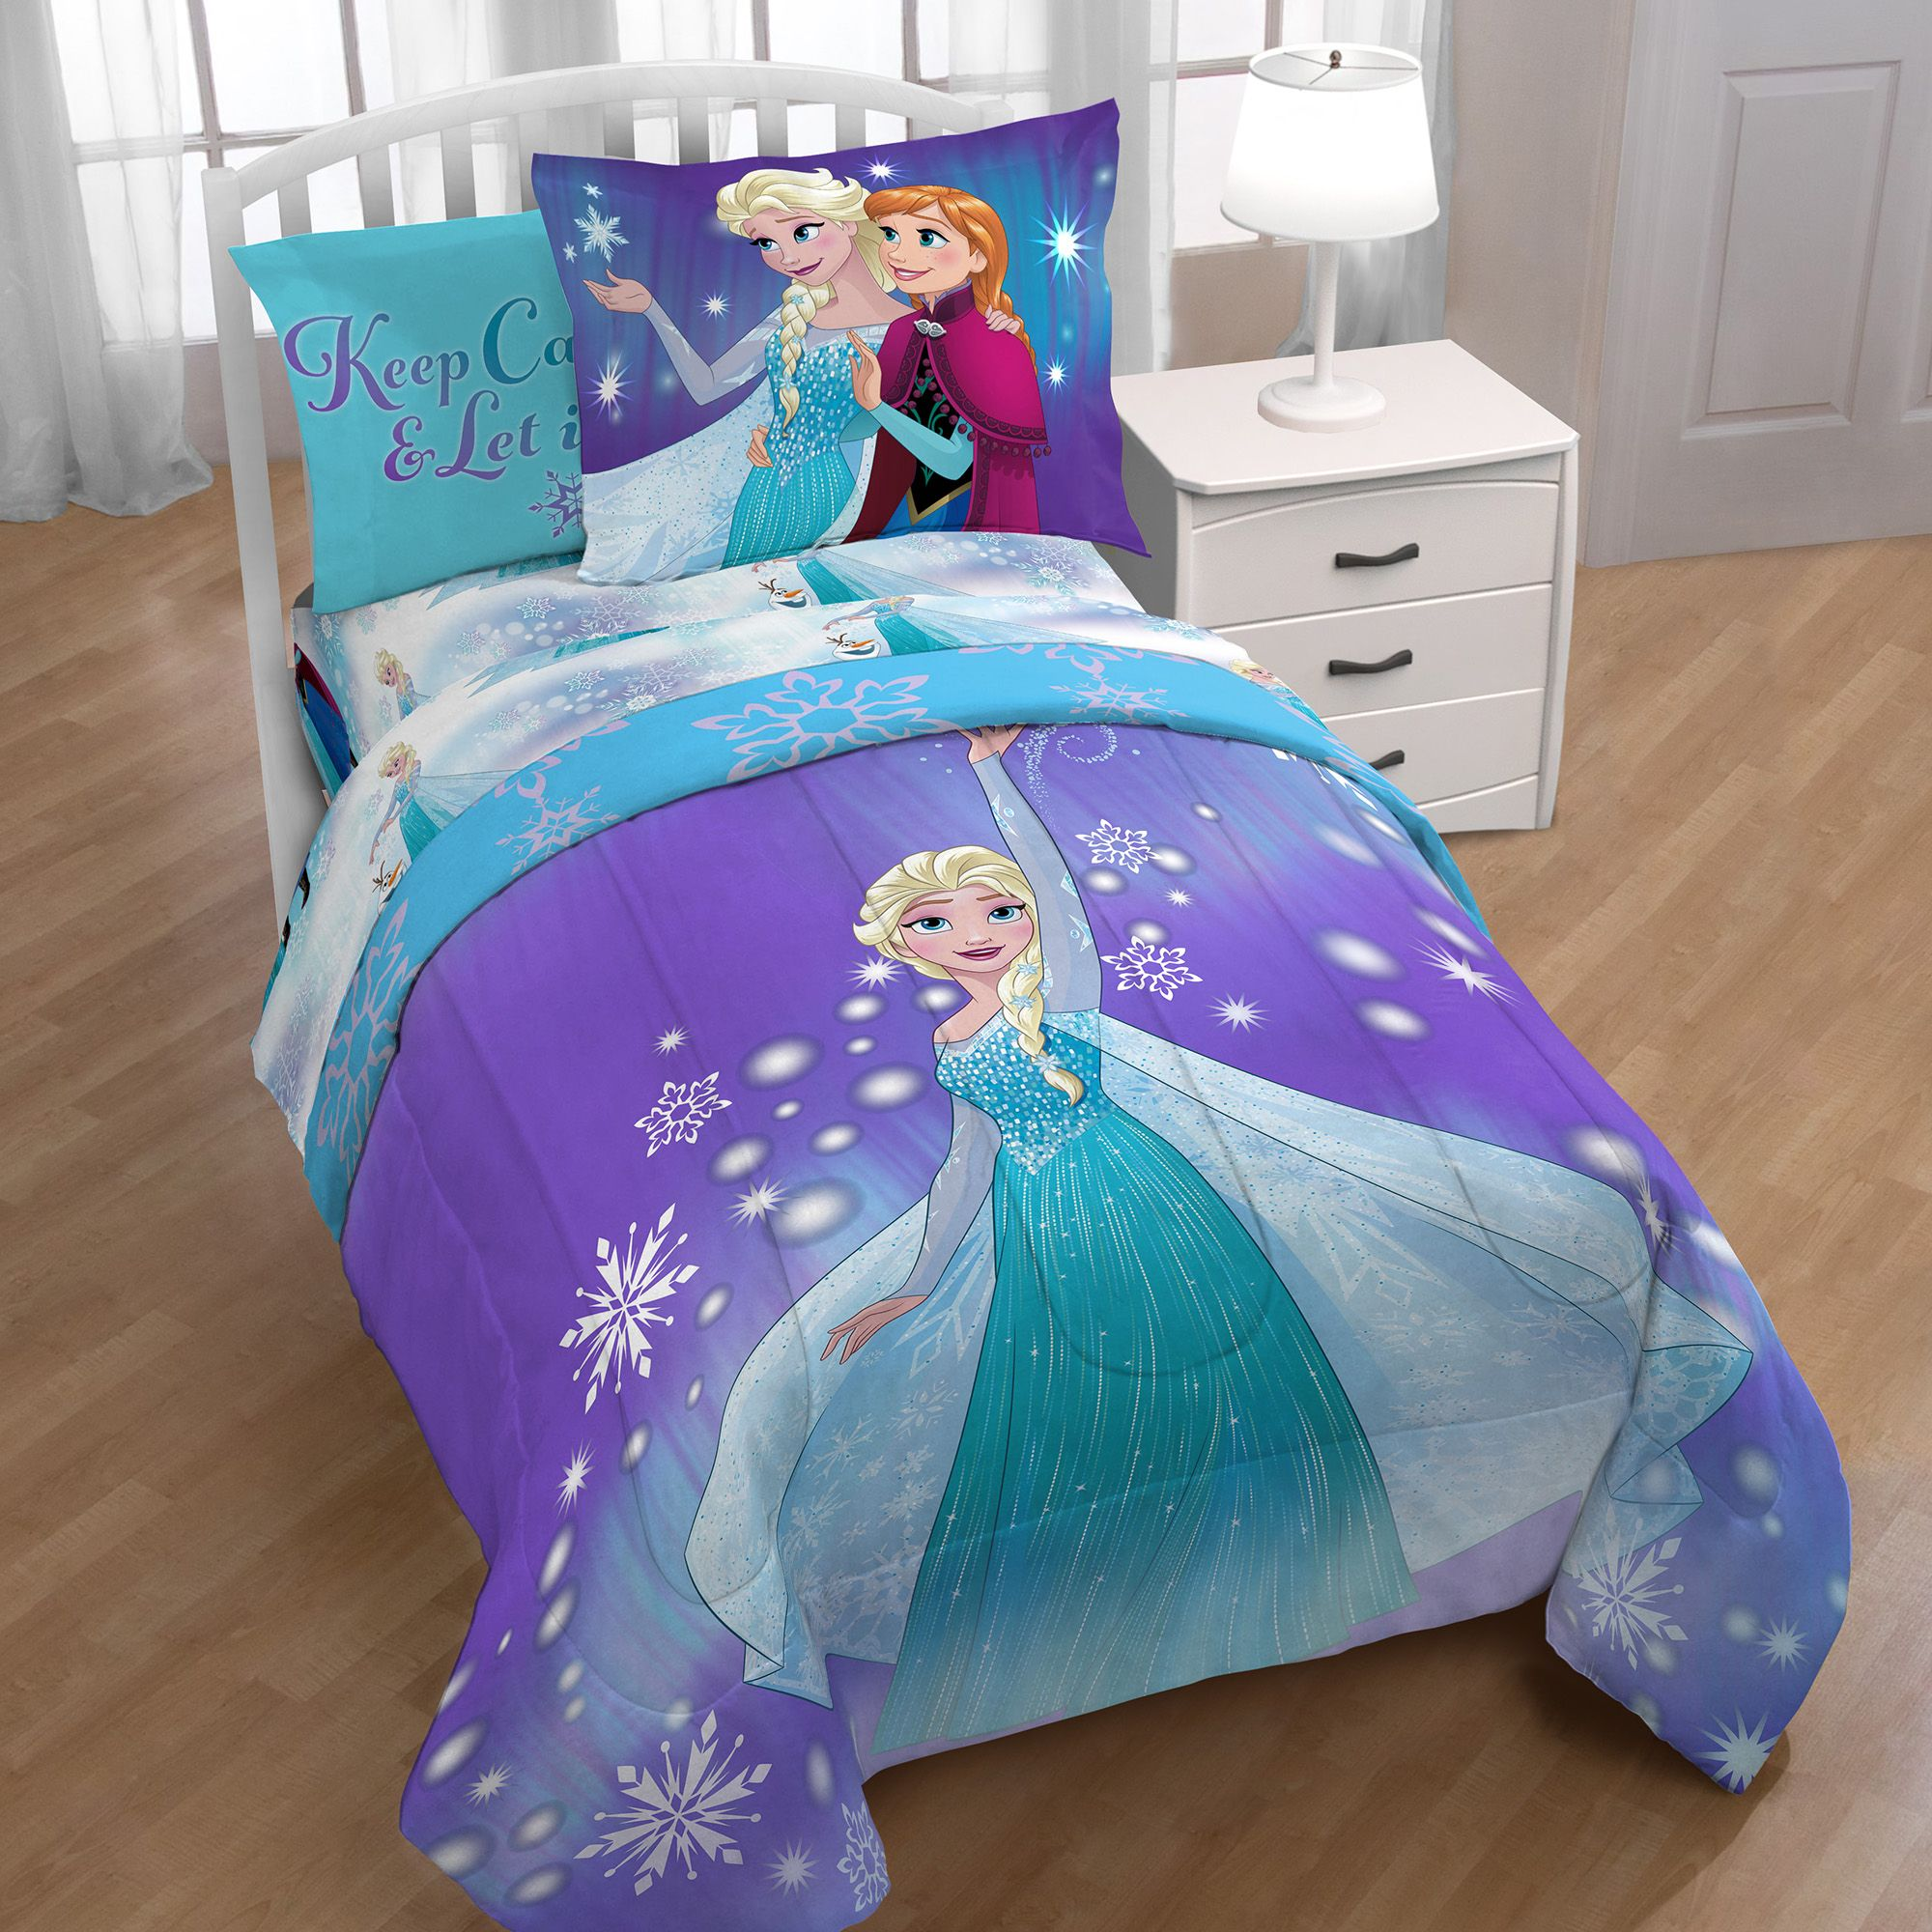 Disney Frozen Magical Winter Full Bed In A Bag - Walmart ...